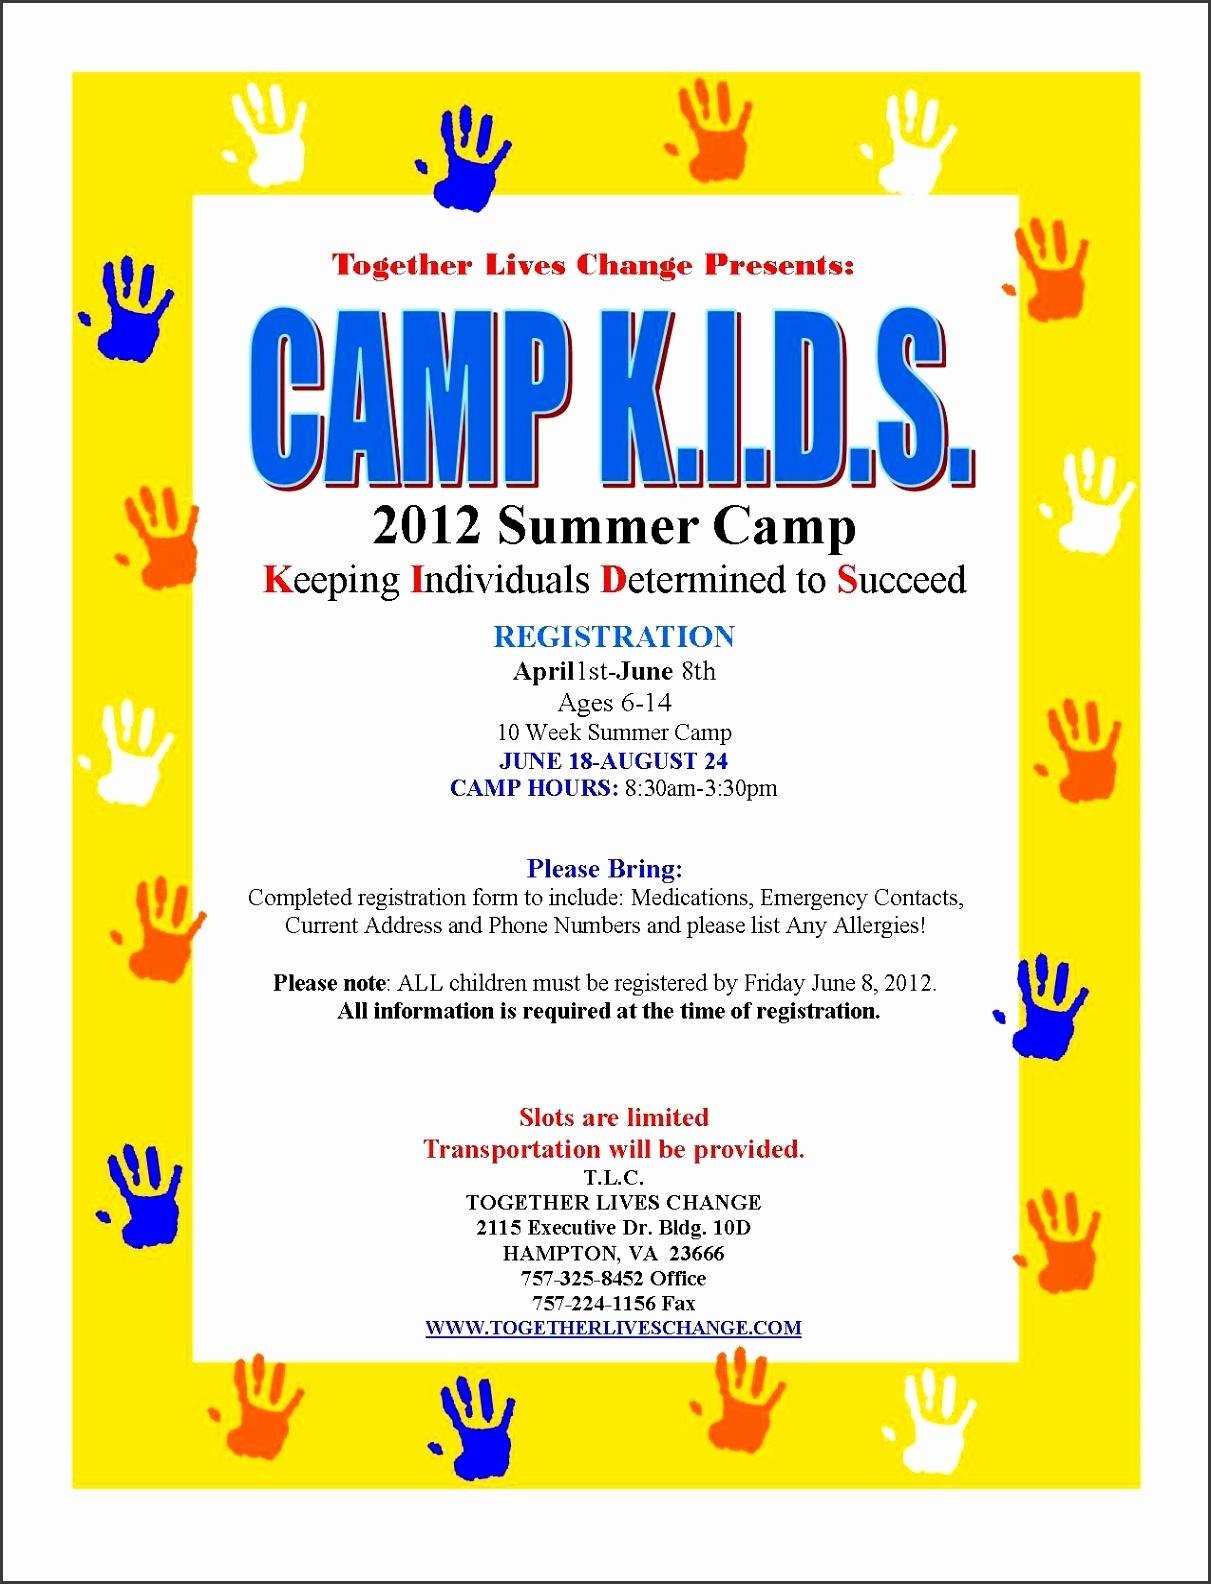 5 Free Summer Camp Registration Form Template - Sampletemplatess  Free Download Blank Summer Camp Application